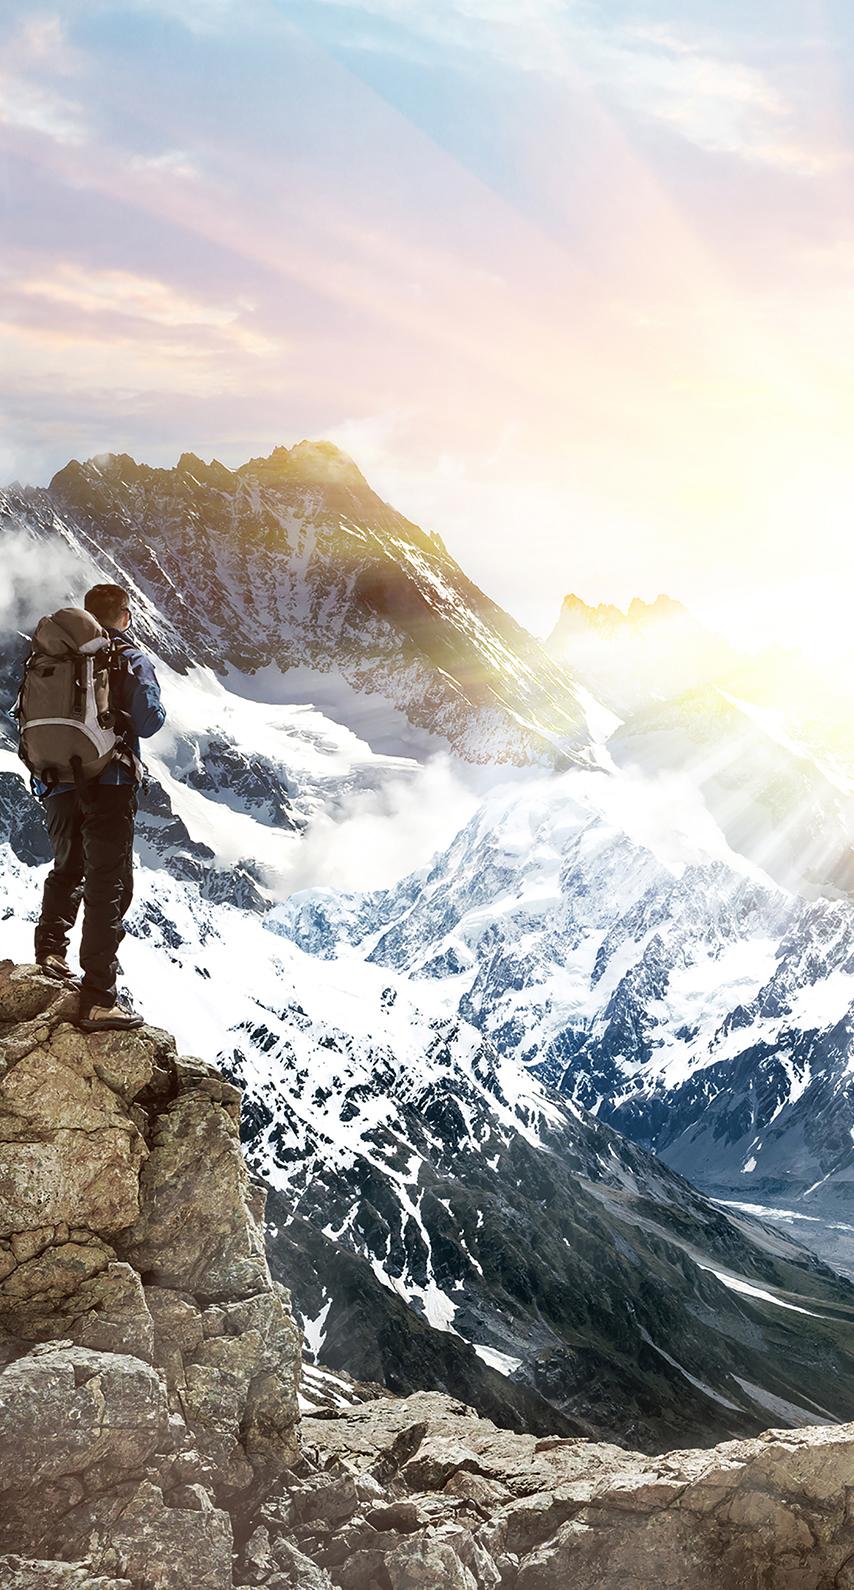 sunset, light, smoke, fantasy, ice, mountain, no person, outdoors, high, cold, mountain peak